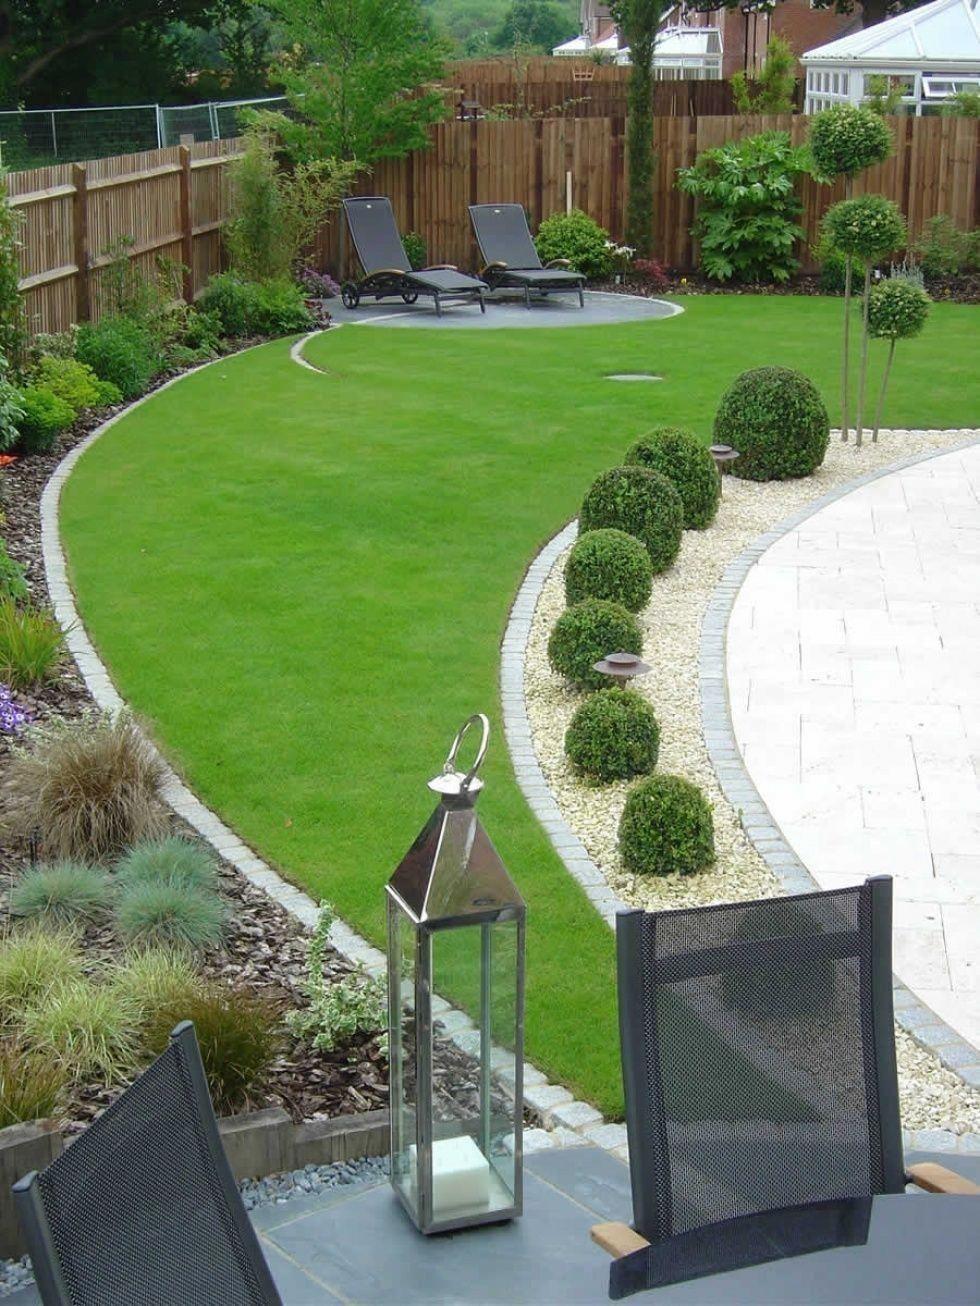 Backyard Landscaping Design Ideas And Tips For Your Perfect Backyard Backyard Garden Landscape Garden Design Modern Garden